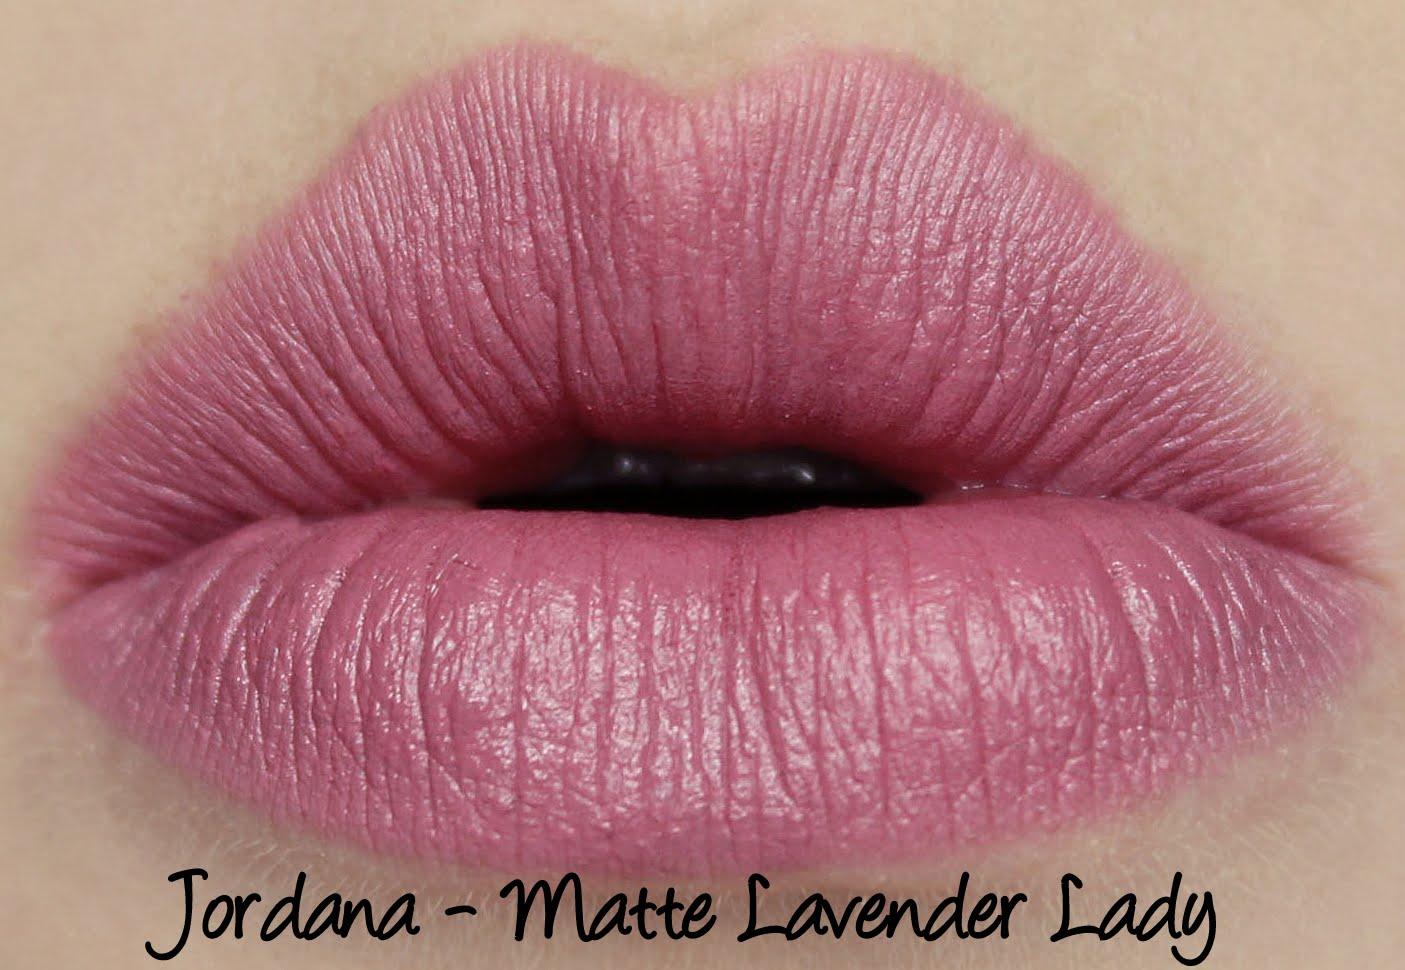 Jordana - Matte Lavender Lady lipstick swatch